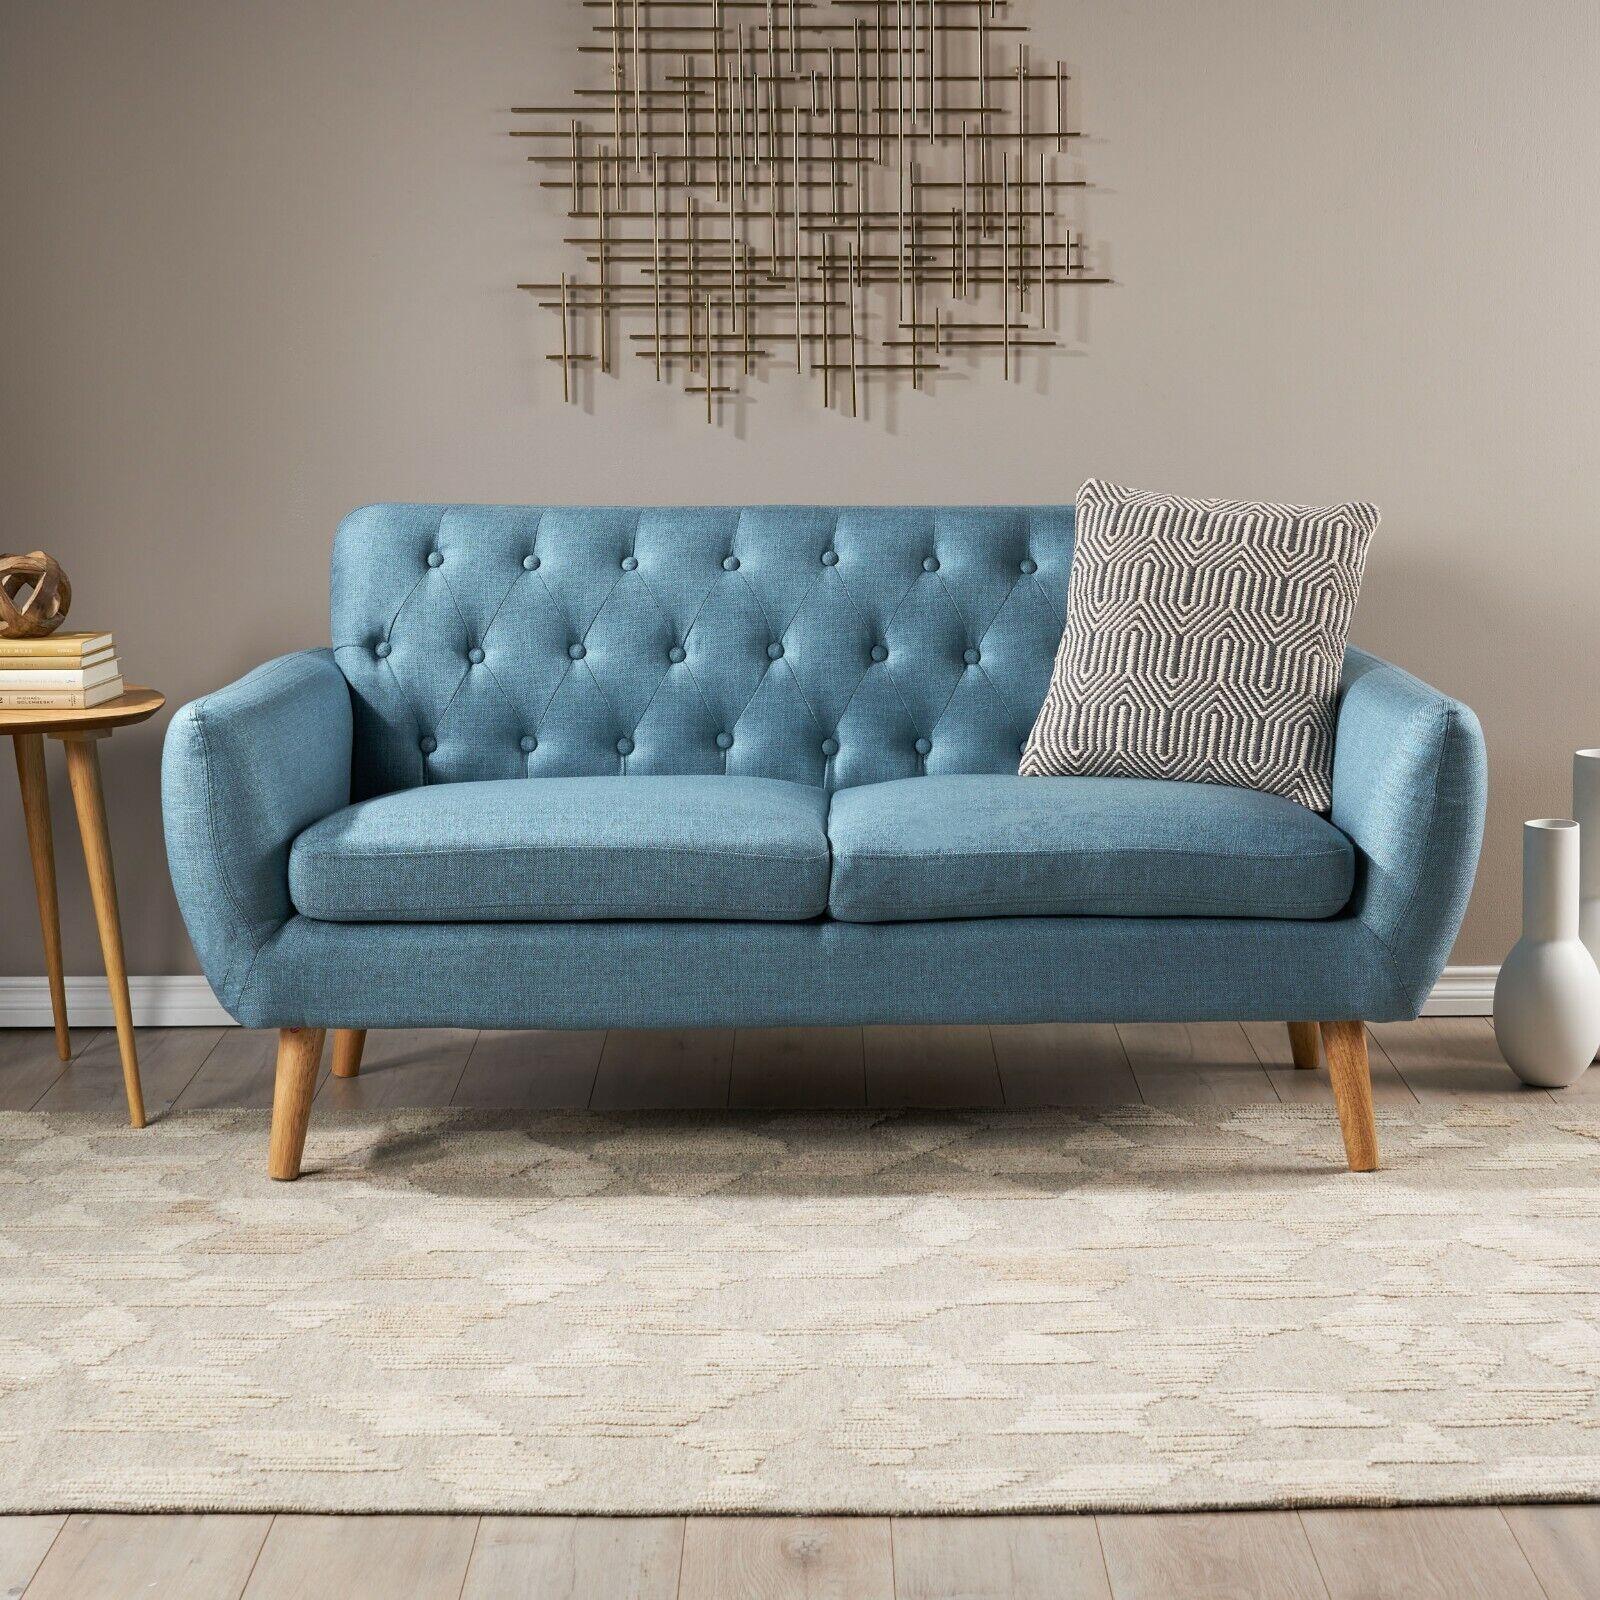 Eunice Petite Mid Century Modern Tufted Fabric Sofa Chairs